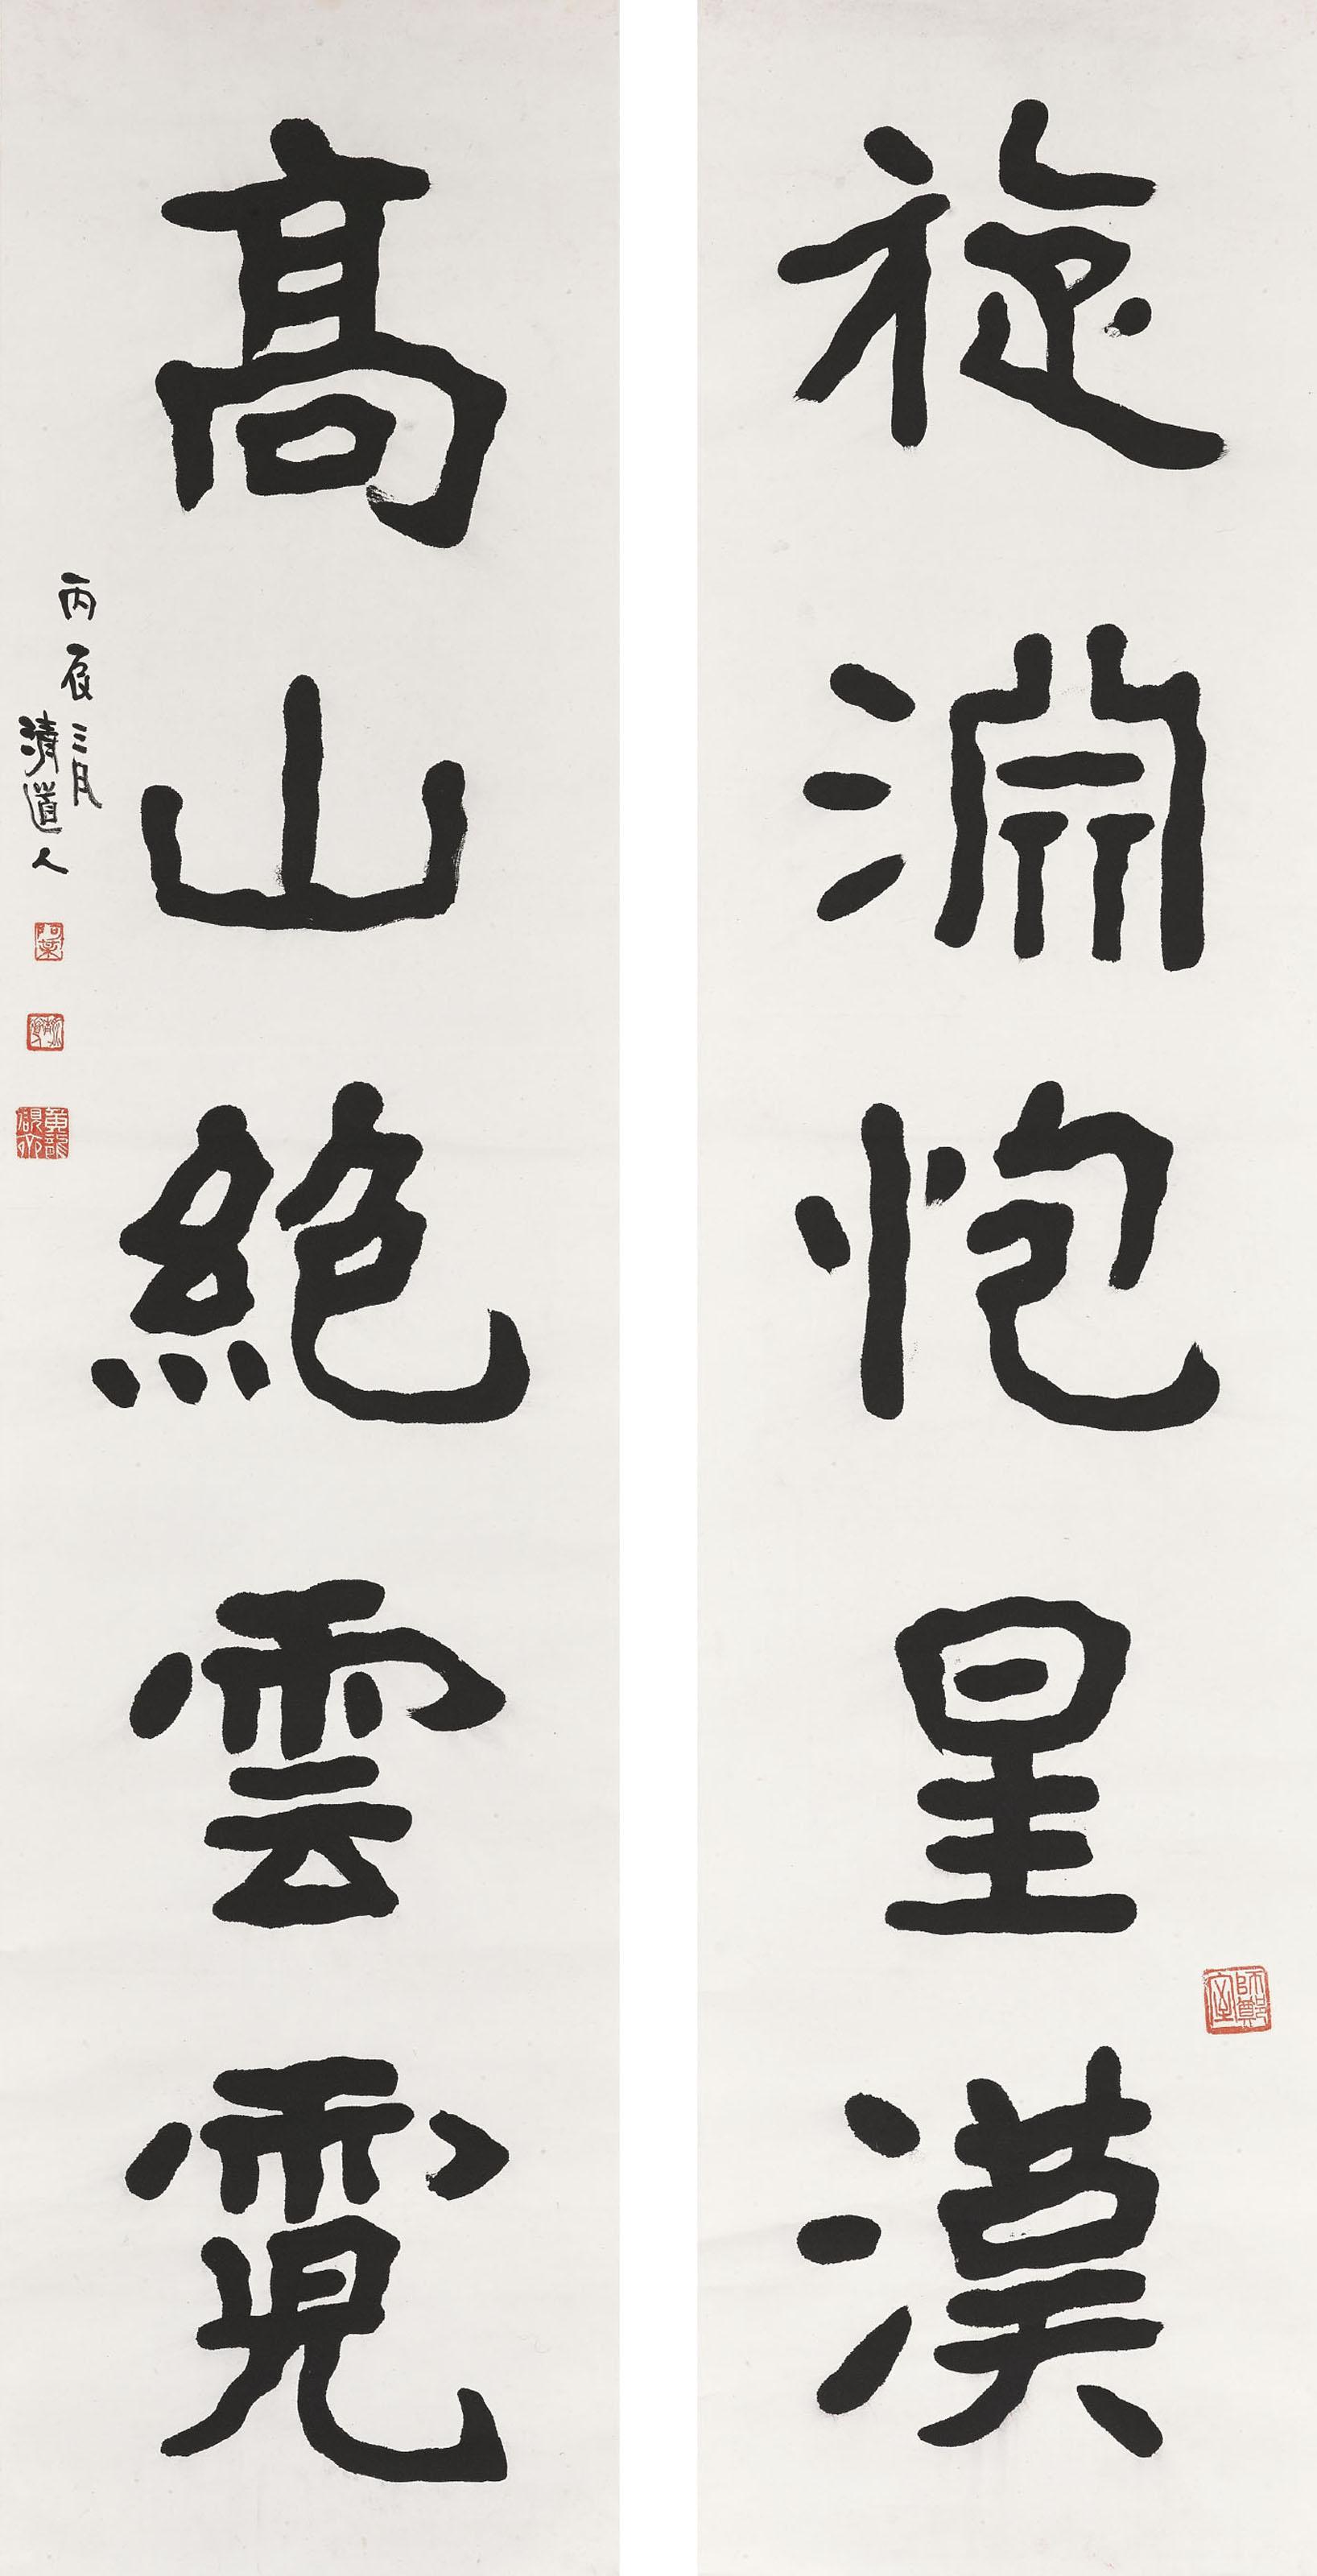 Calligraphic Couplet/Calligraphic Couplet